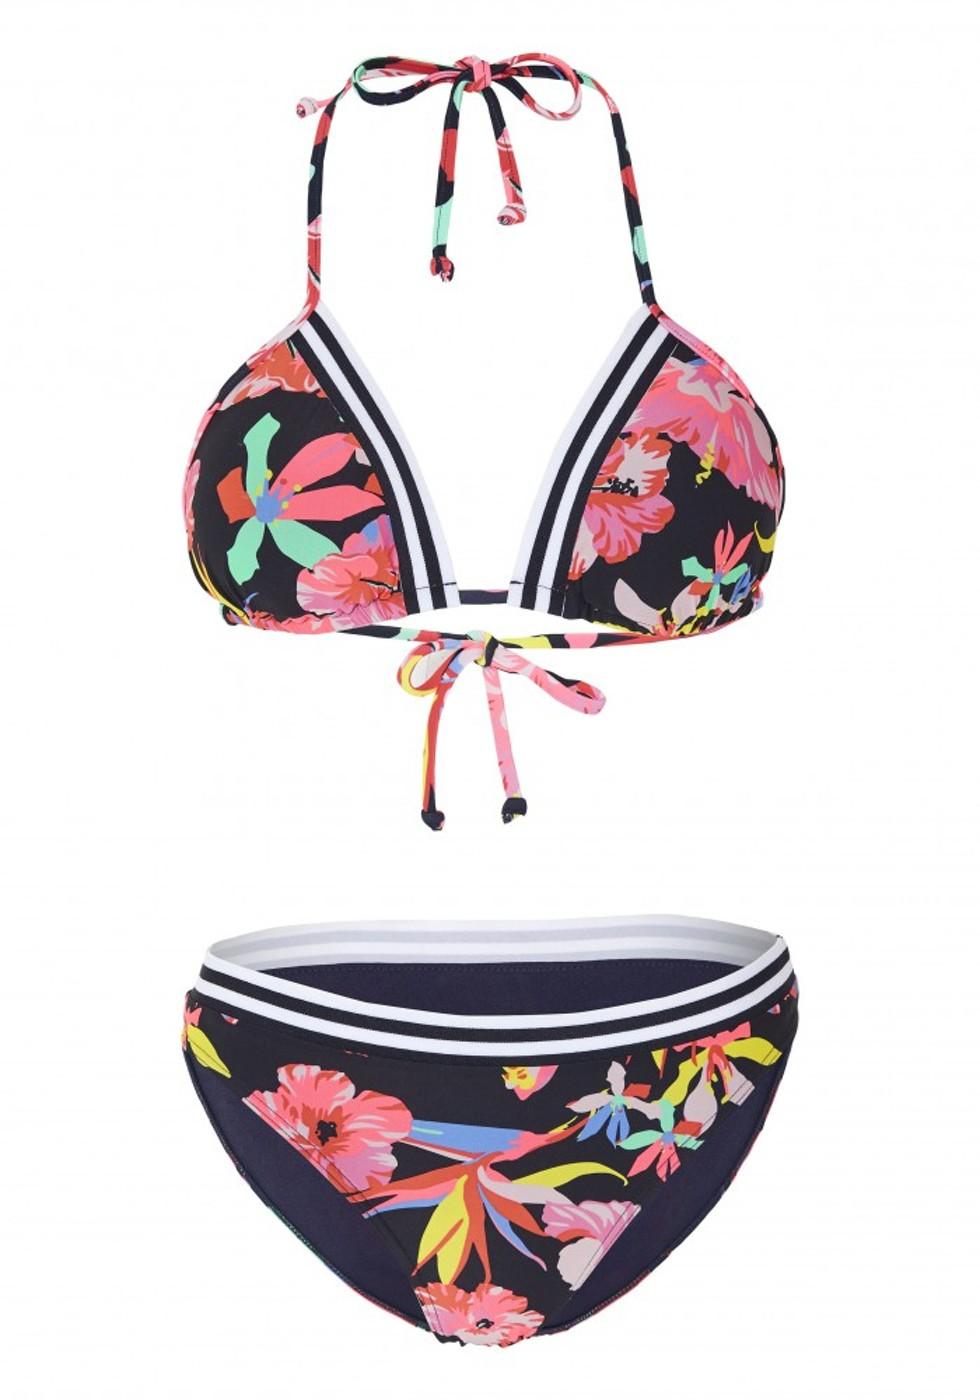 CHIEMSEE PORGY Women, Bikini, Tight Fit - Damen